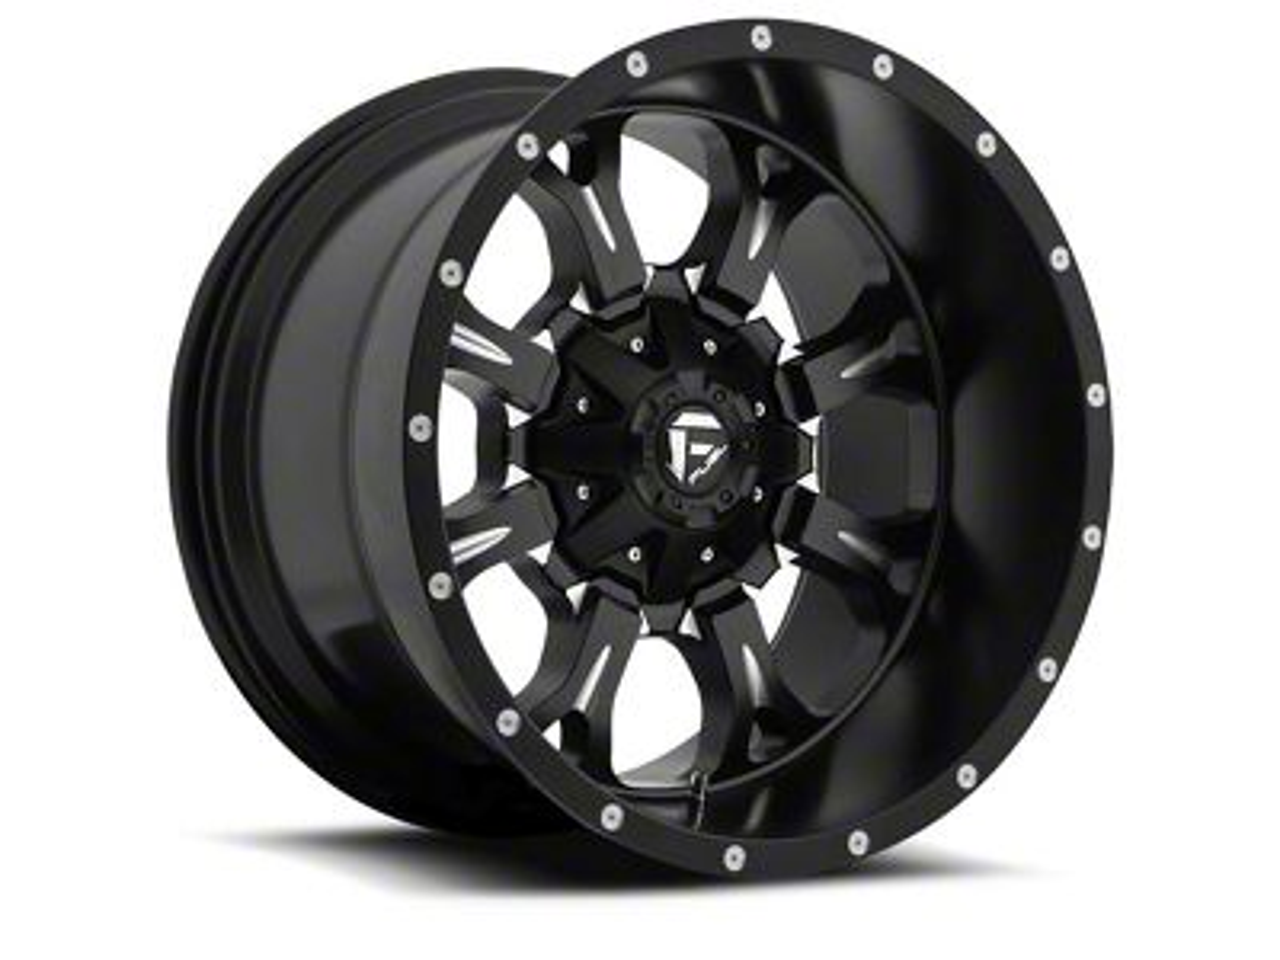 Fuel Wheels Krank Black Milled 5-Lug Wheel - 20x12 (02-18 RAM 1500, Excluding Mega Cab)